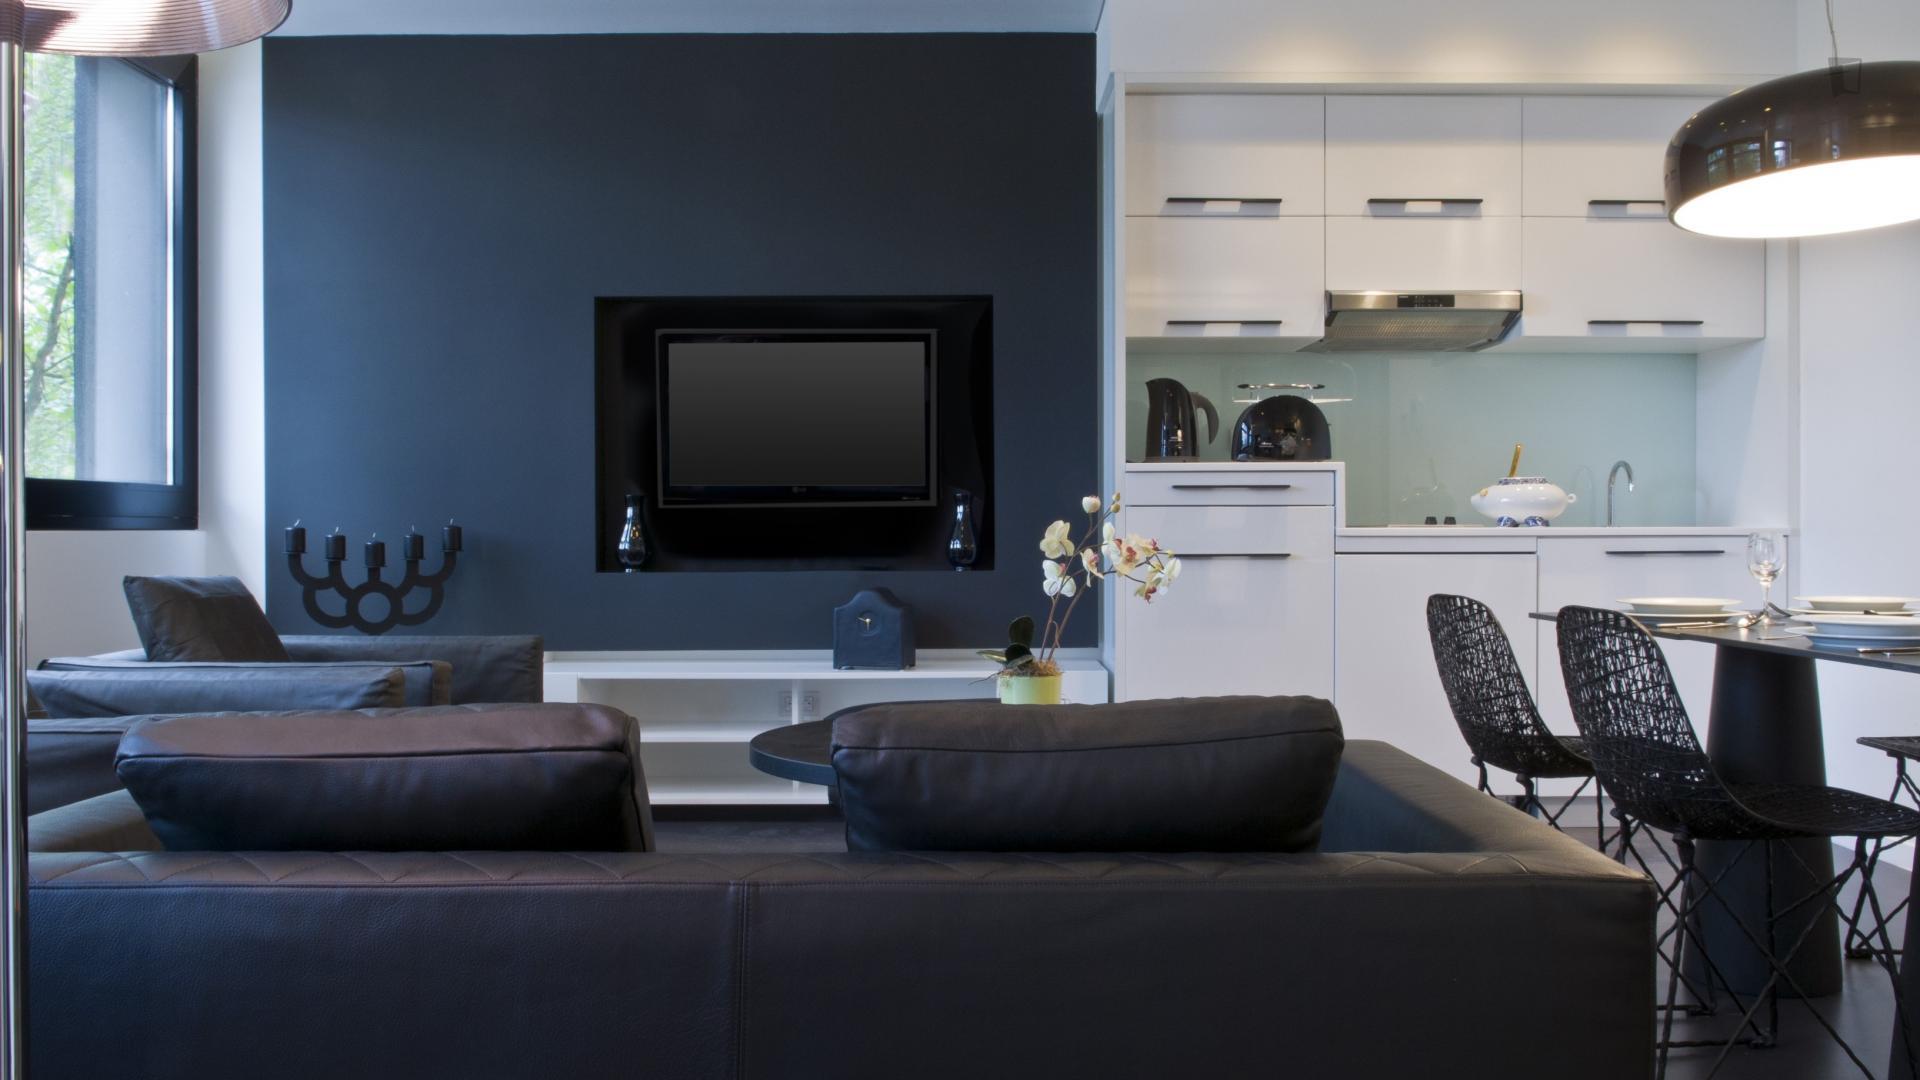 Parc - Modern expat flat in Brussels